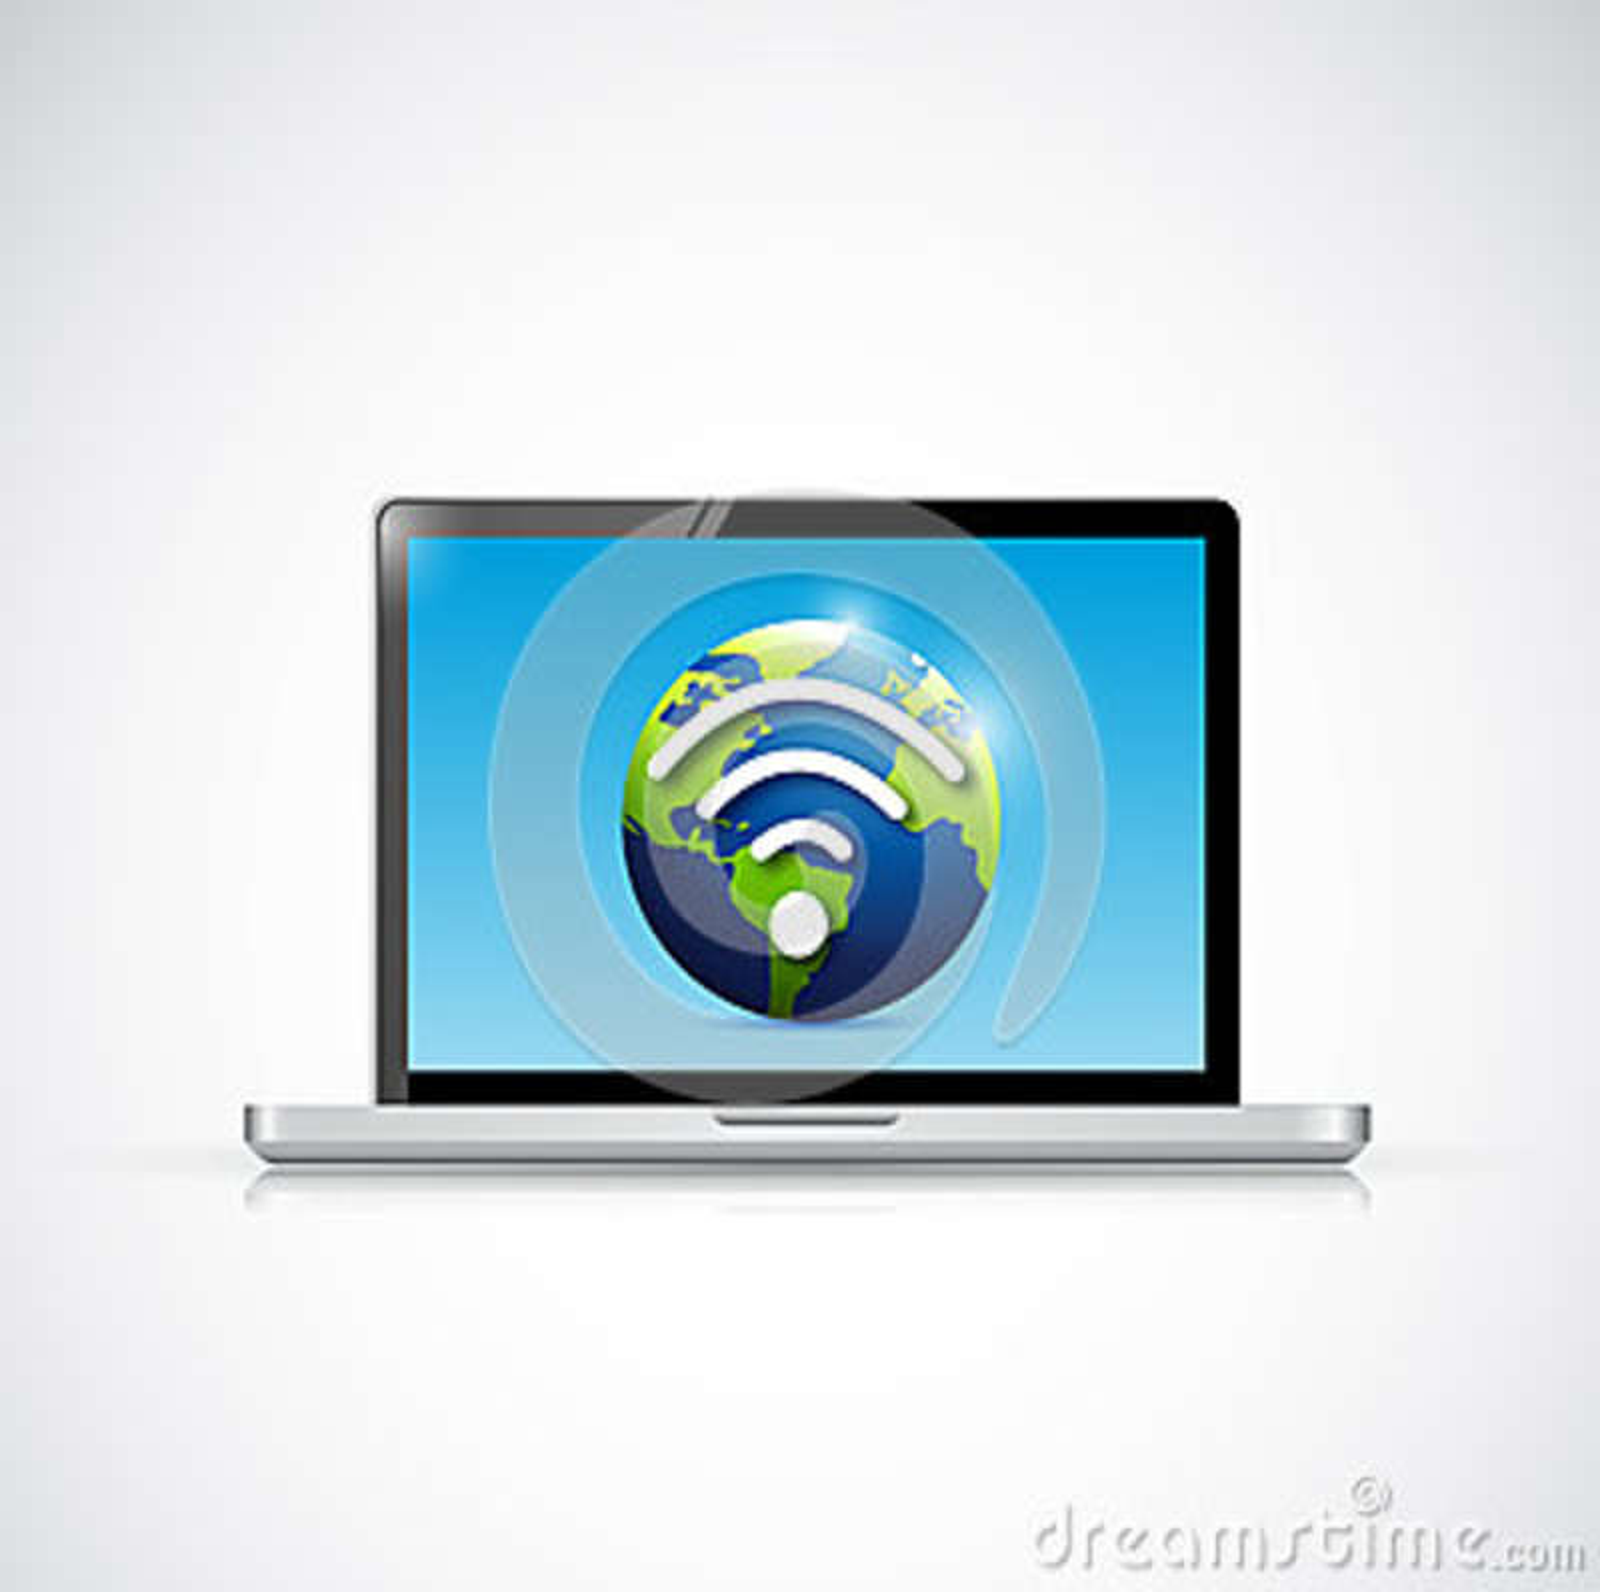 Laptop and globe wifi signal illustration design